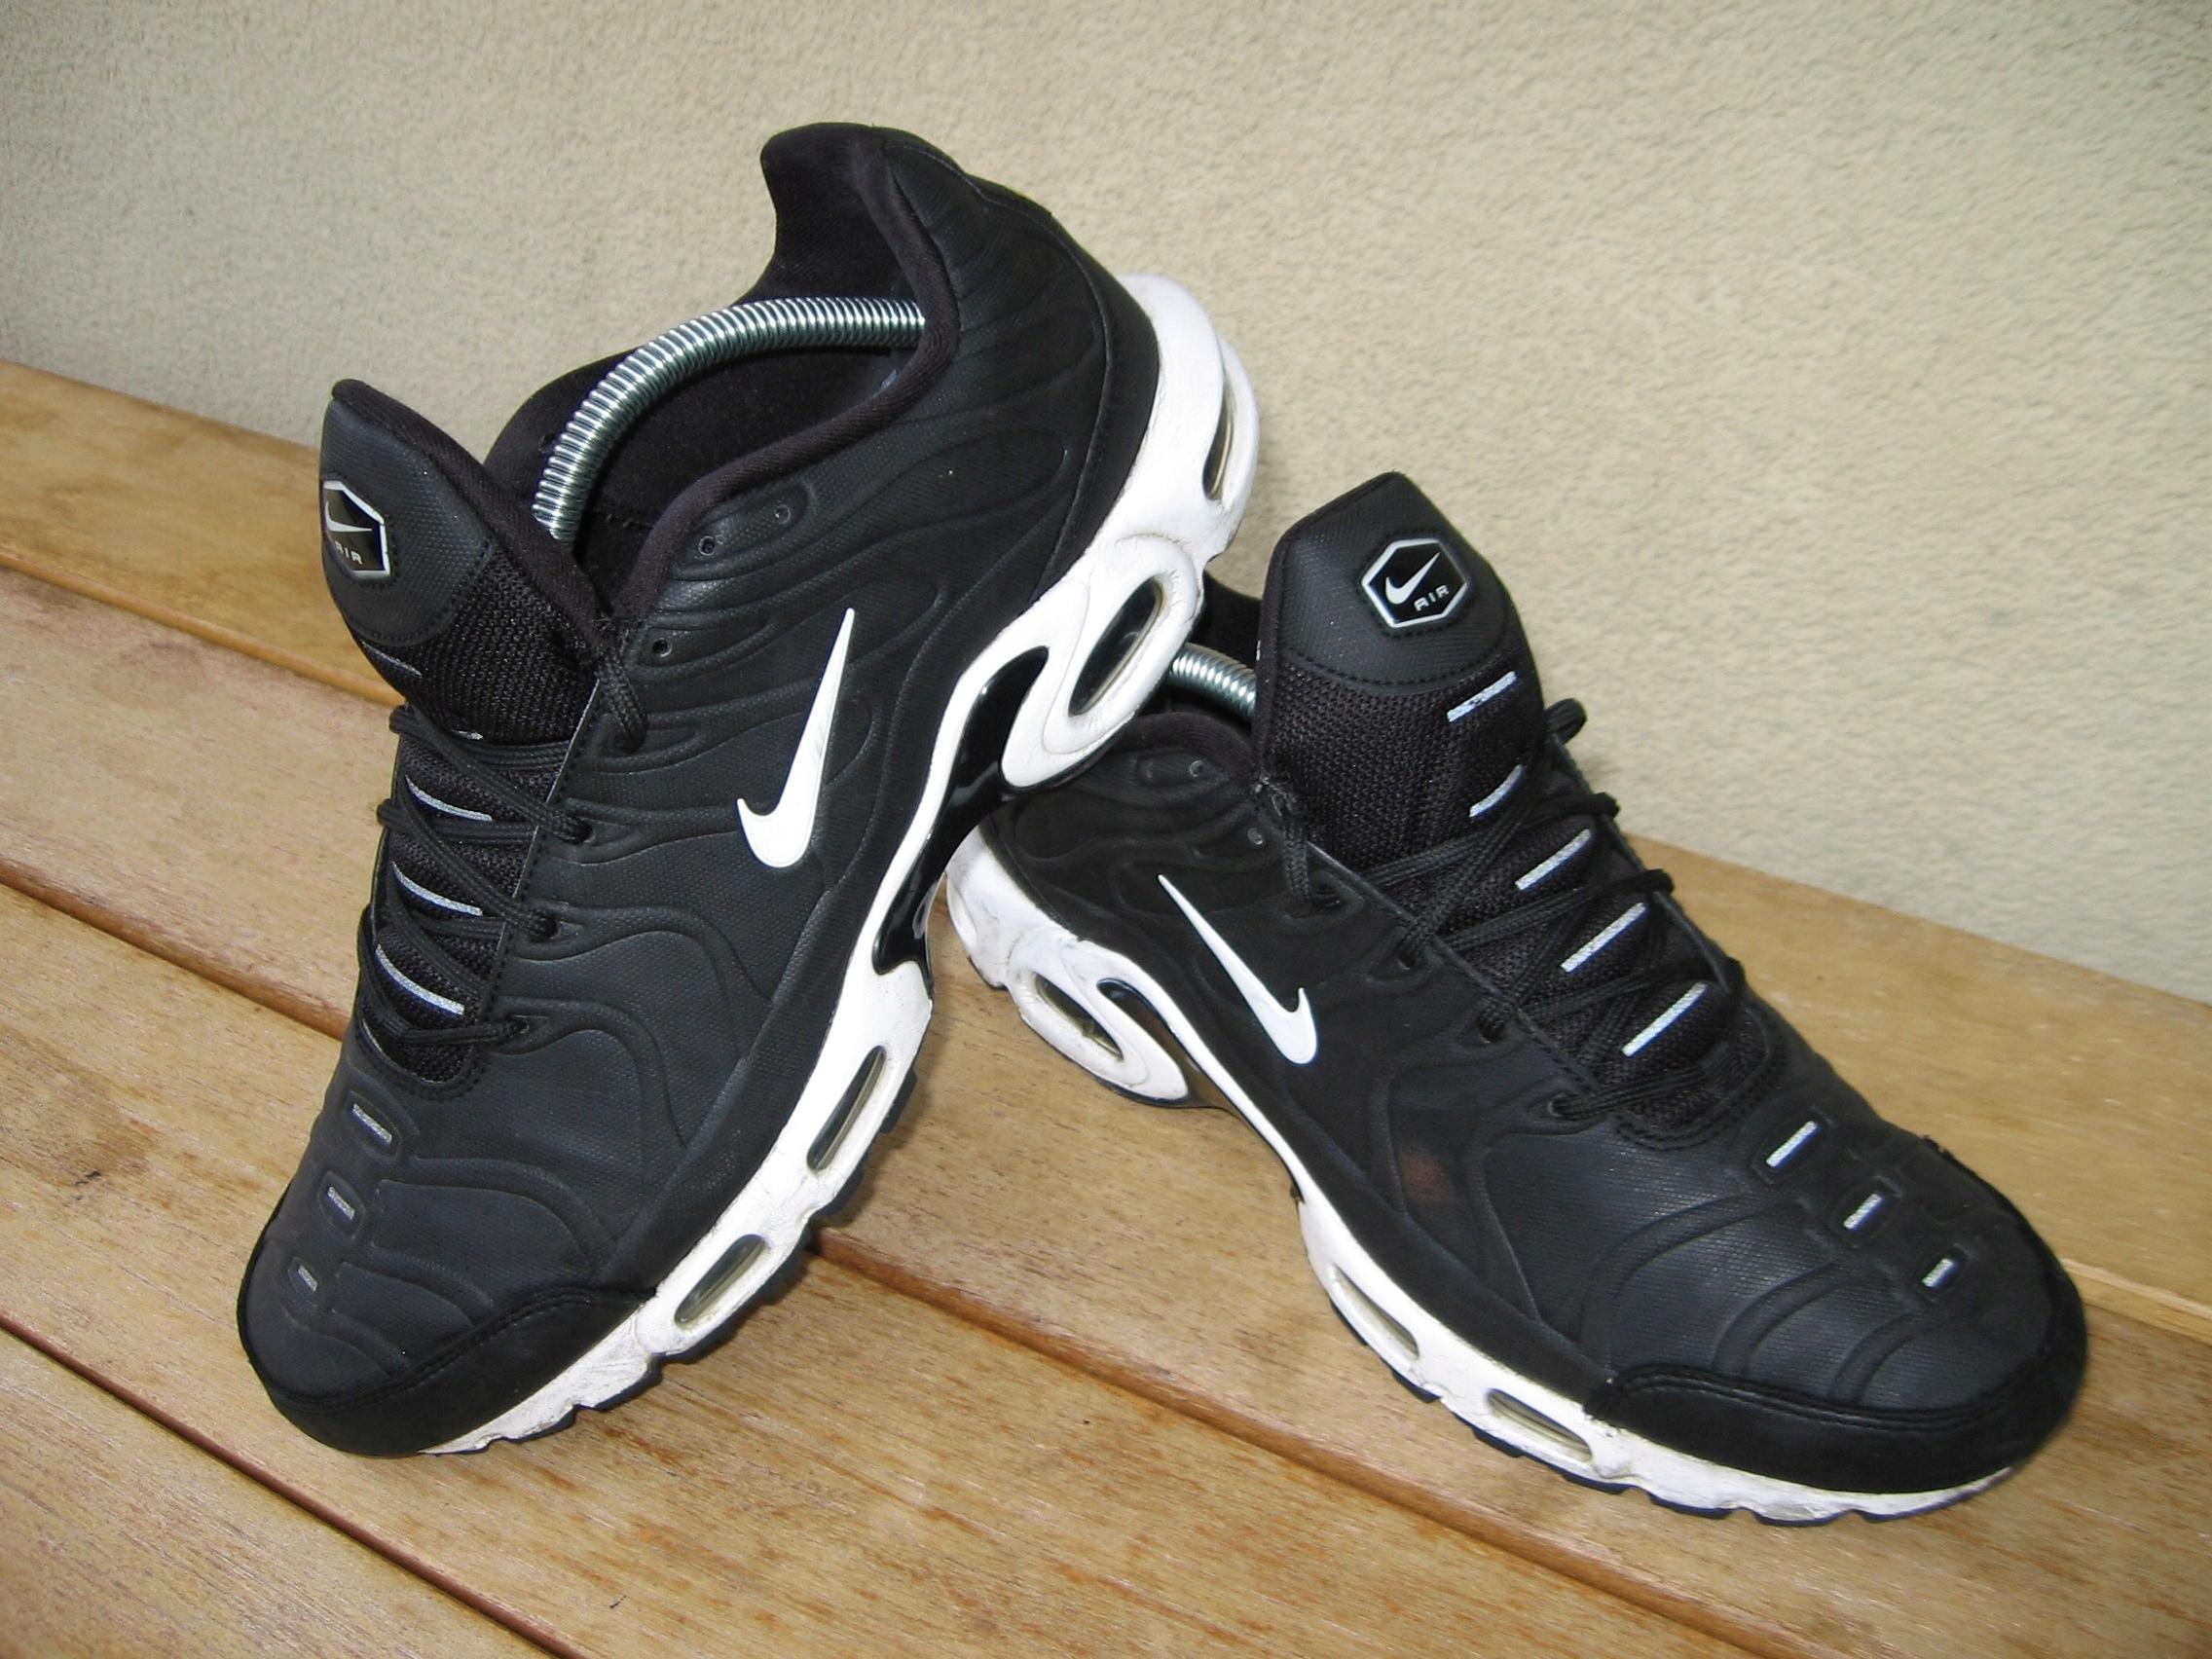 online store 2a9d2 edd61 Nike AIR MAX Tn buty sportowe r.44,5 w.28,5